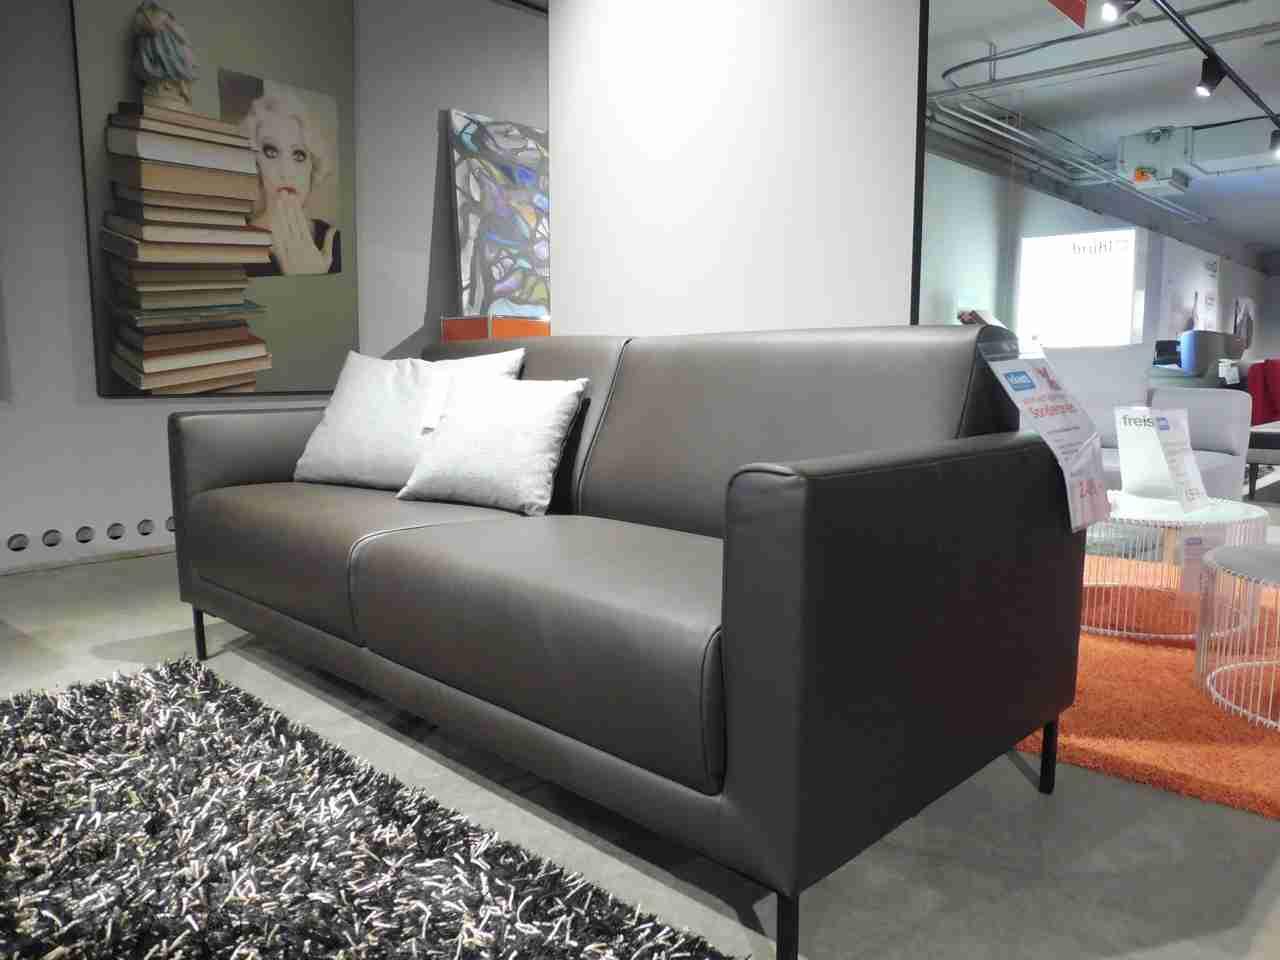 Full Size of Freistil Ausstellungsstück 141 Sofa Reduziert Hmel Bett Küche Wohnzimmer Freistil Ausstellungsstück